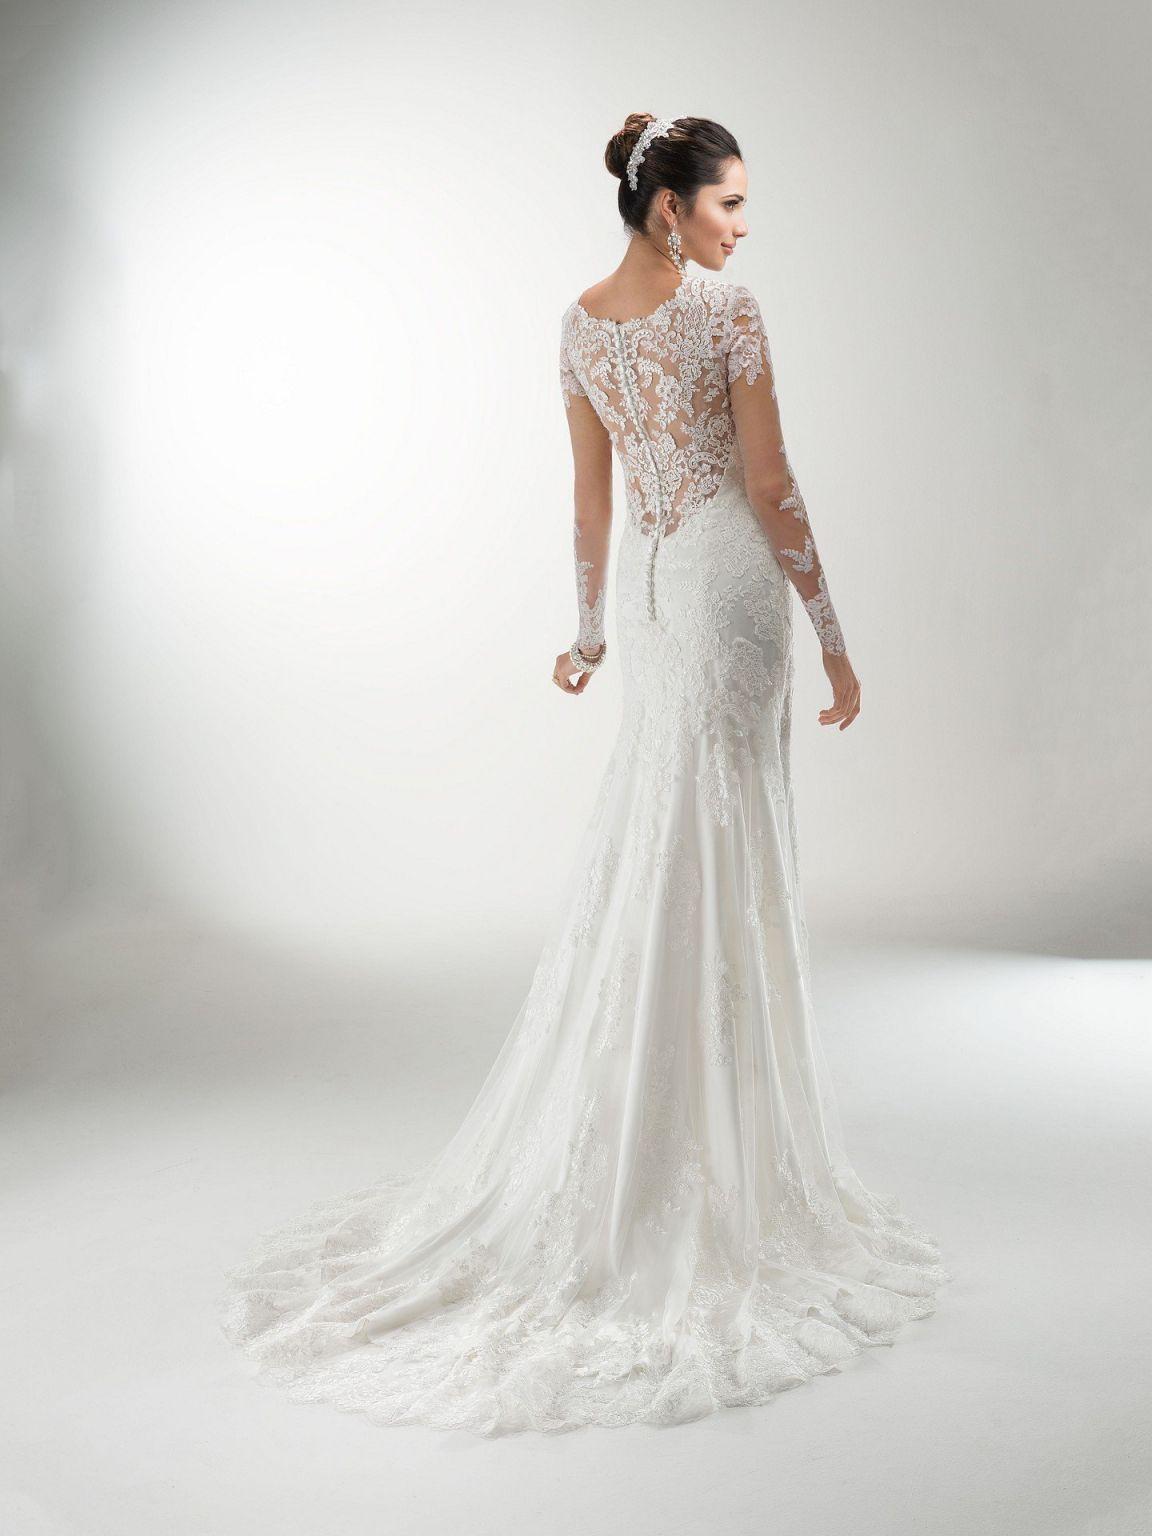 Maggie Sottero Melanie Marie Wedding Dress New, Size 10